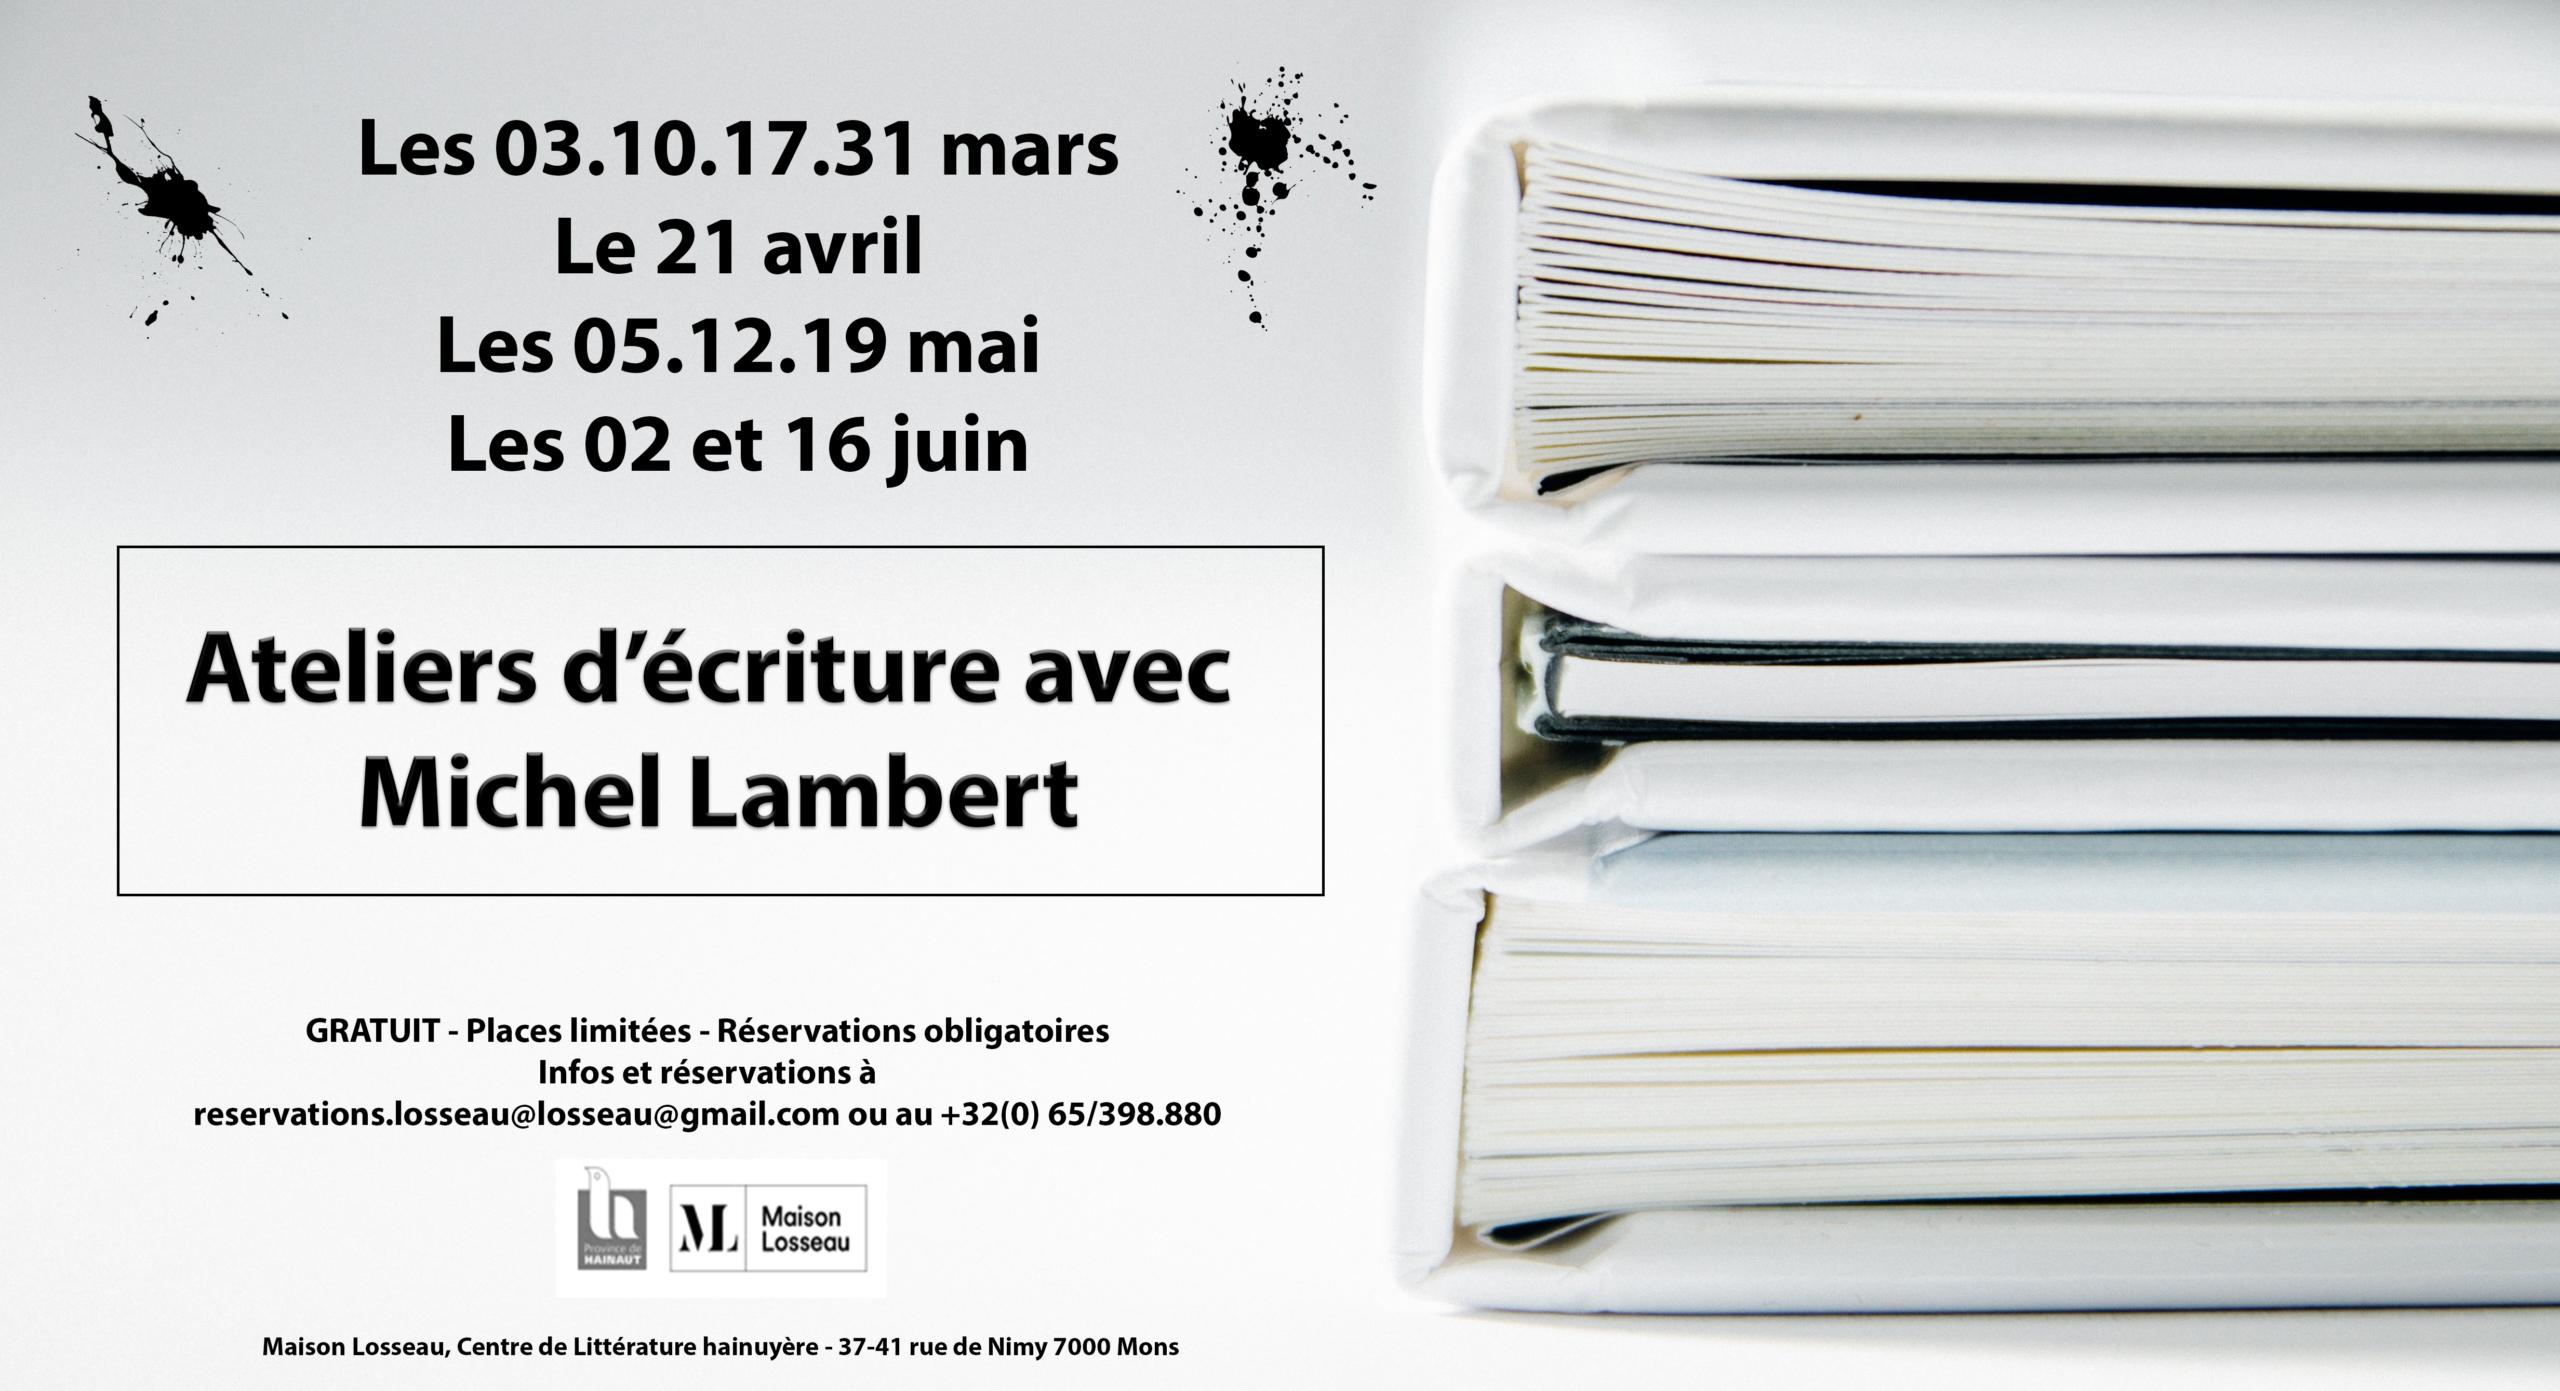 Ateliers d'écriture de Michel Lambert